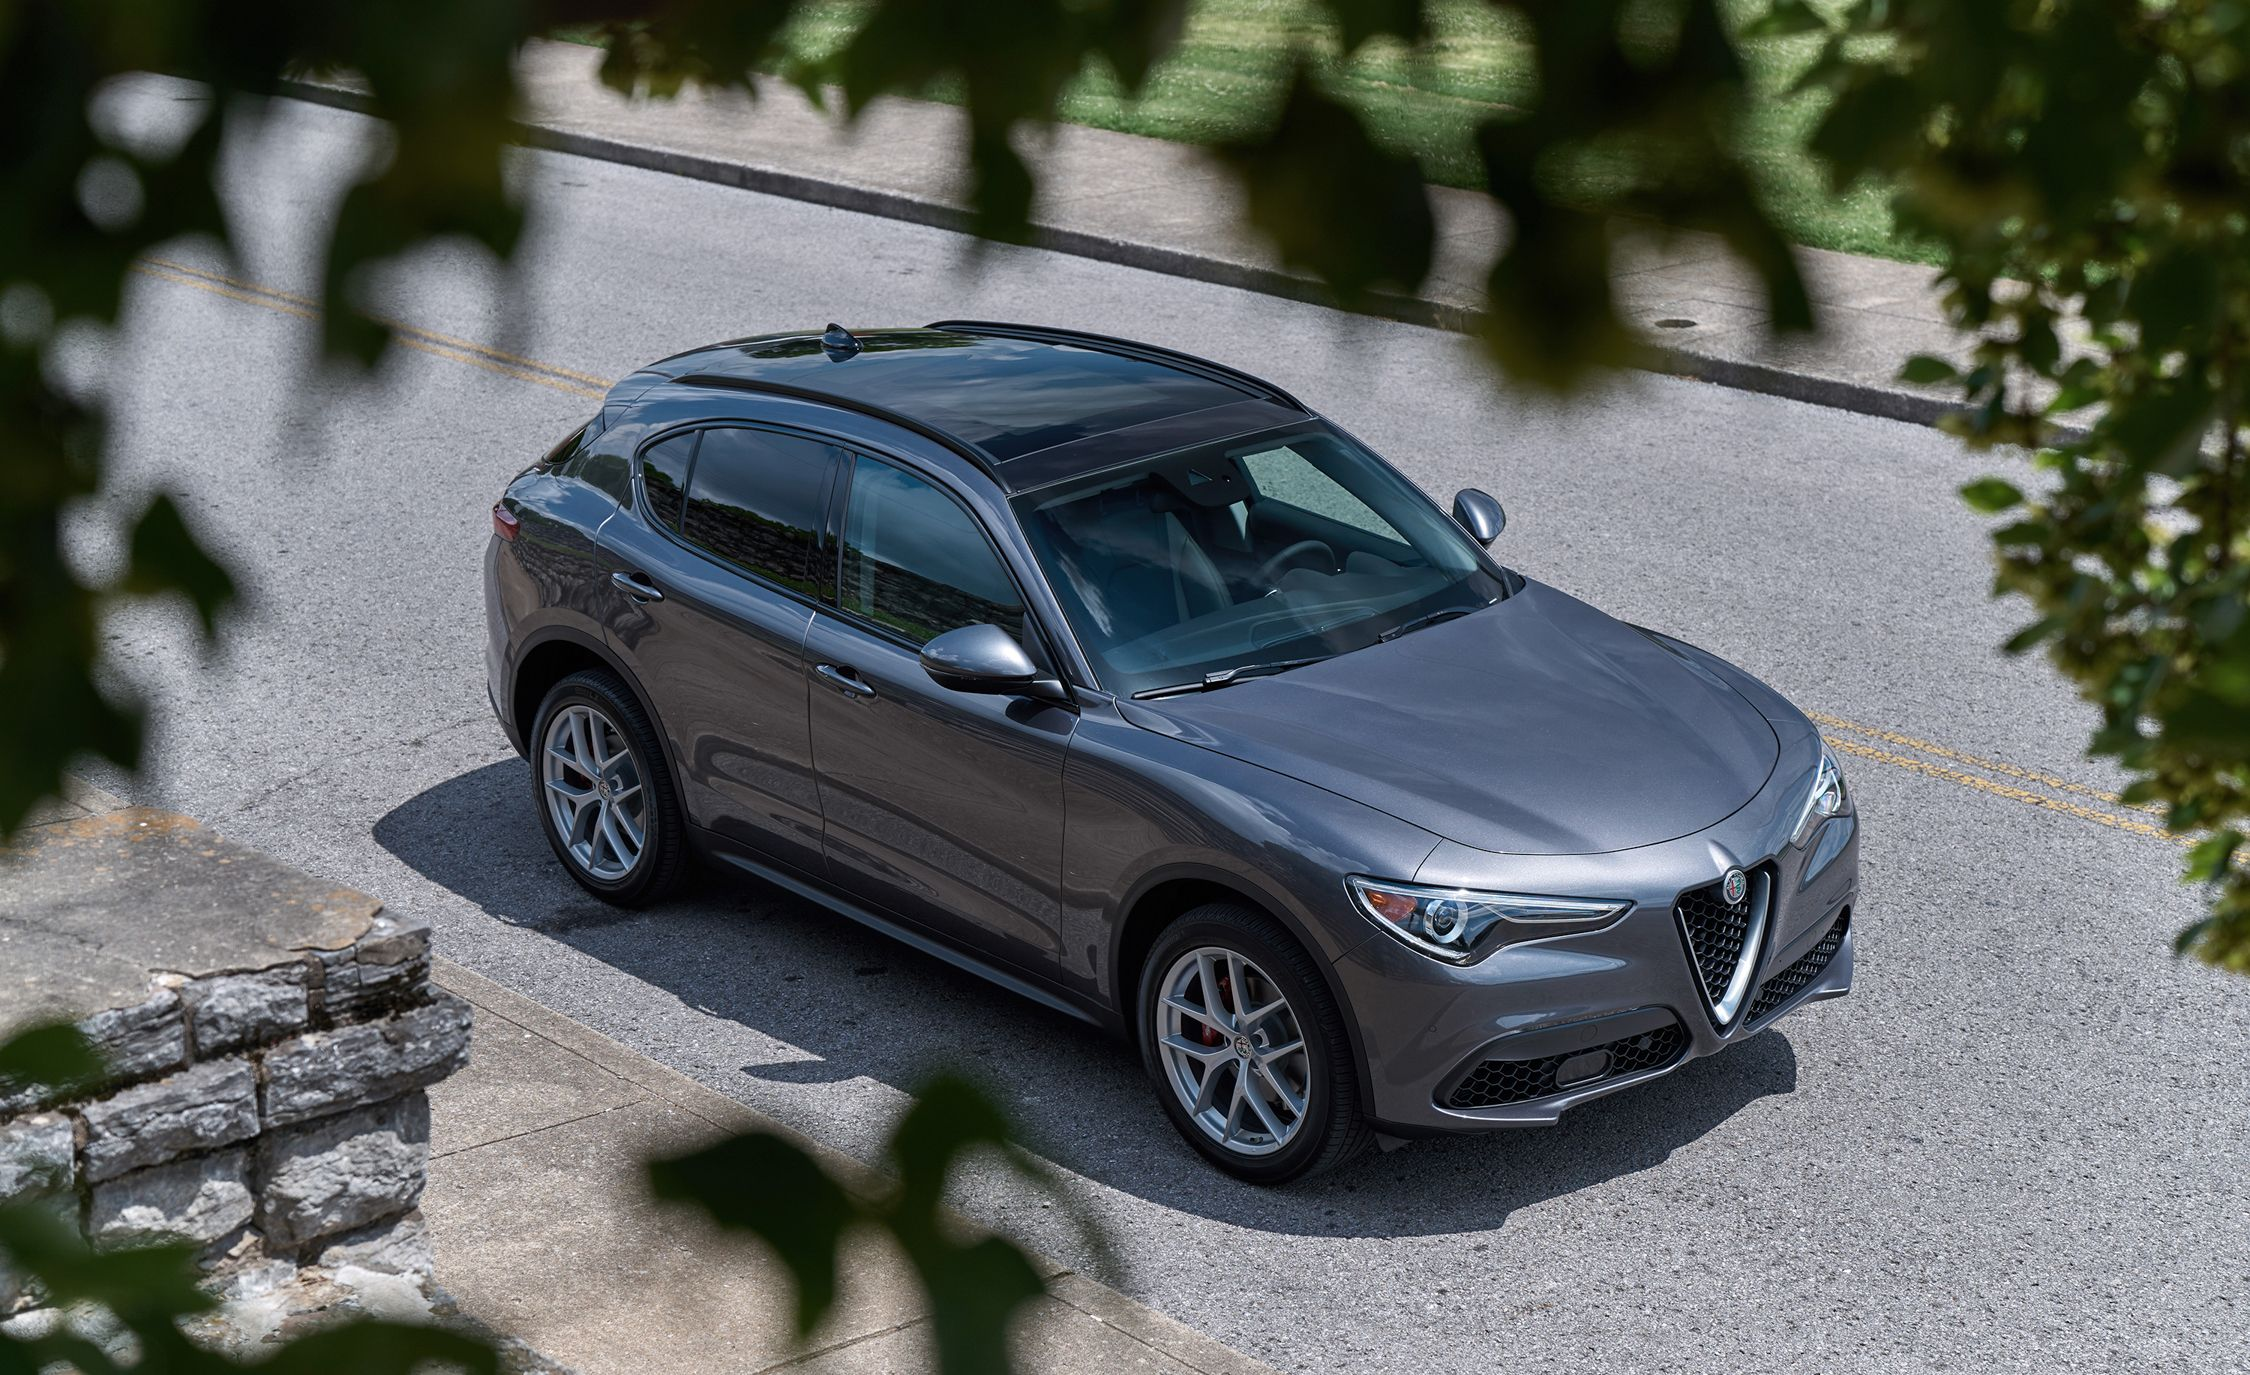 2019 Alfa Romeo Stelvio Adds Cheaper Rwd Variant News Car And Driver